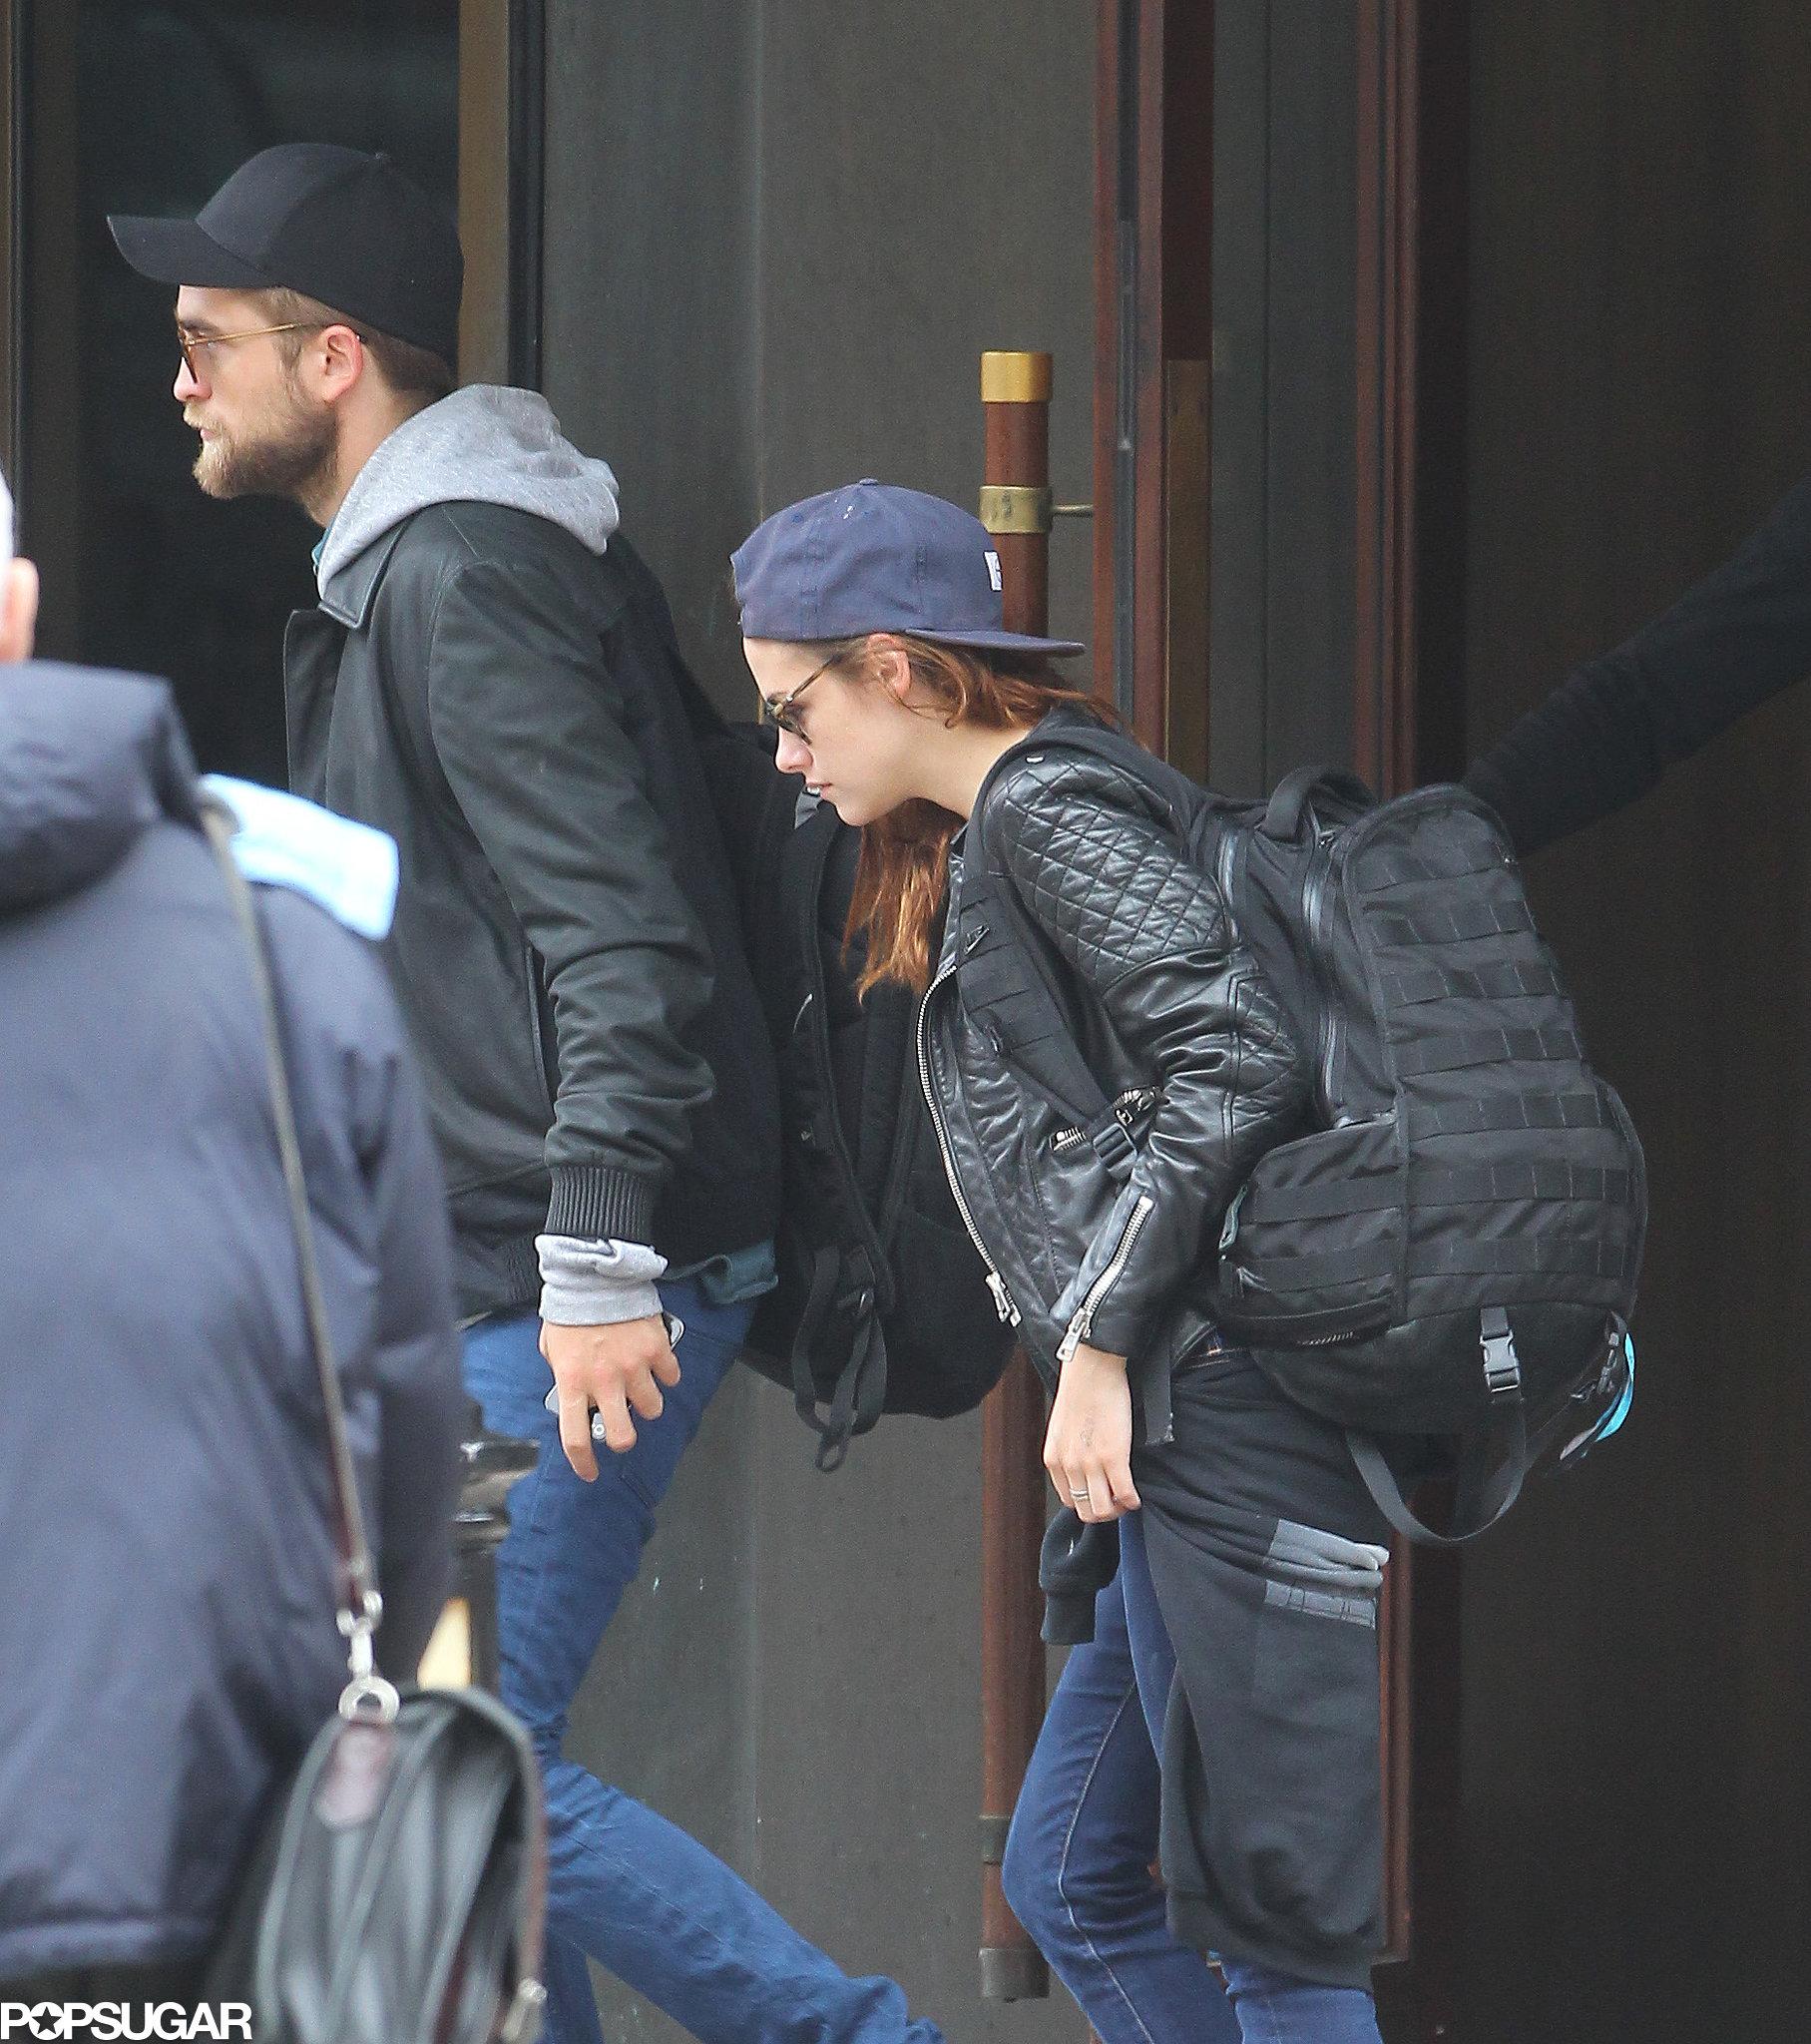 Kristen Stewart followed Robert Pattinson to their car.